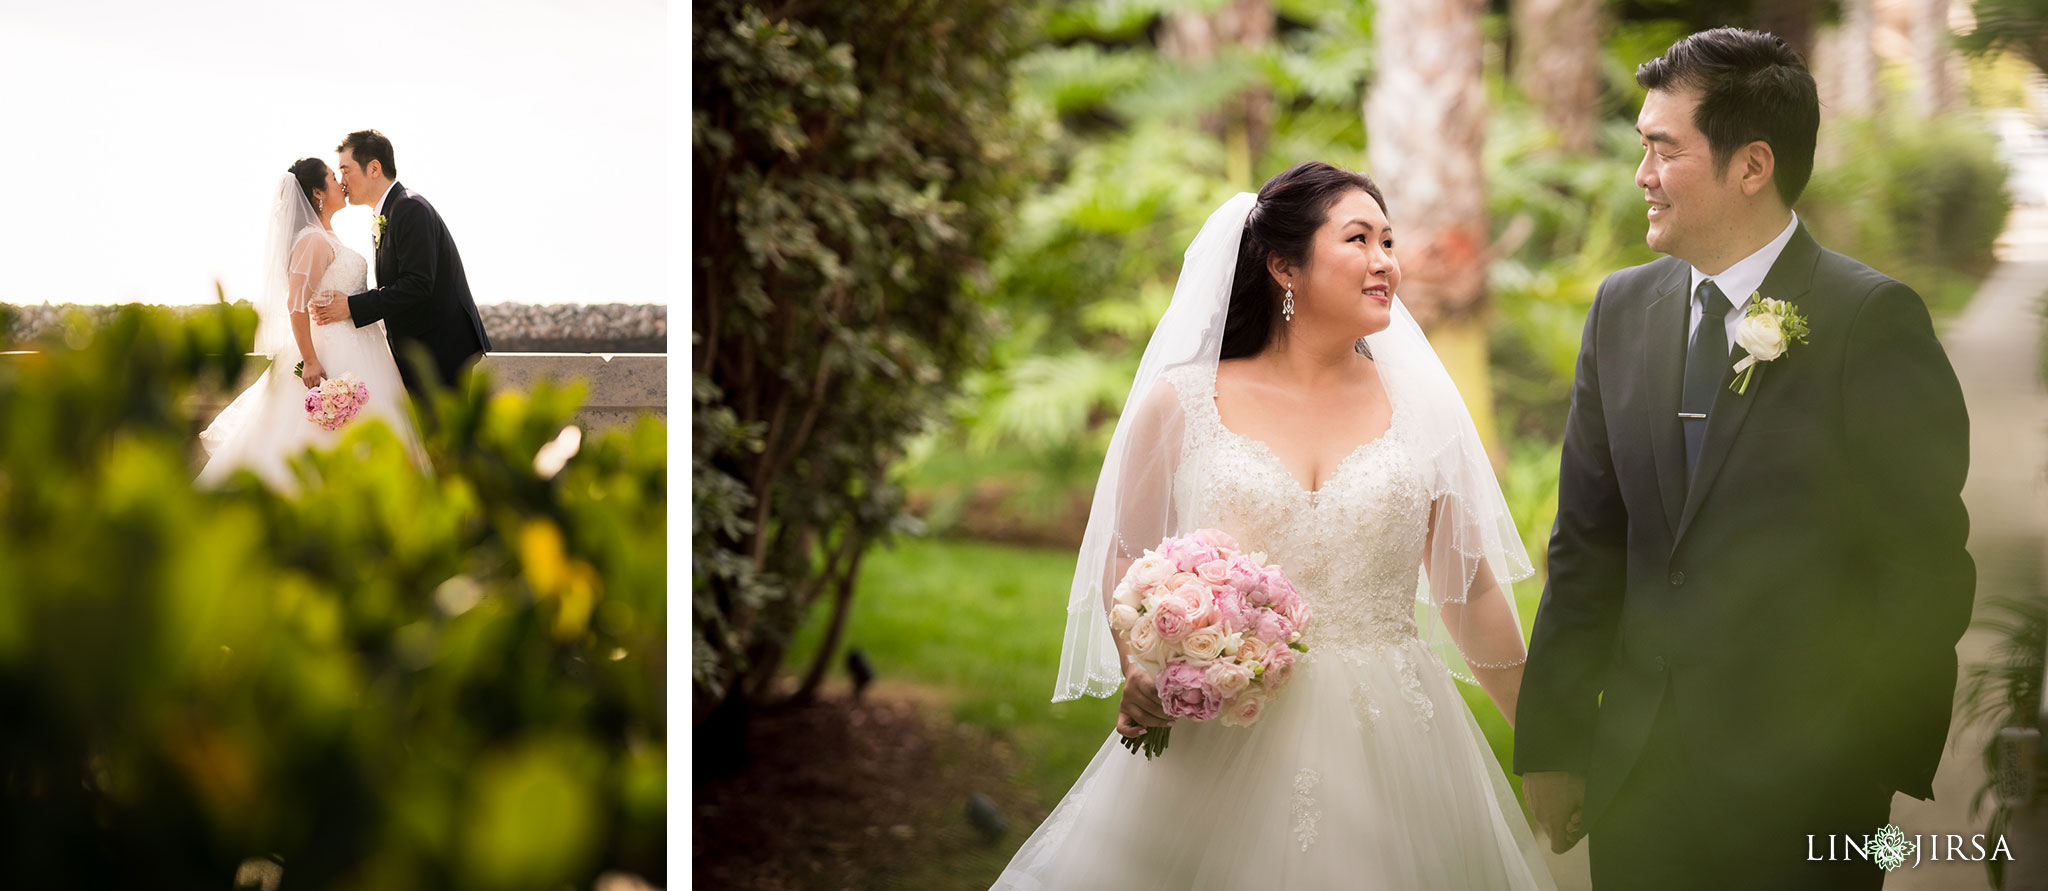 14 portofino hotel redondo beach bride groom wedding photography